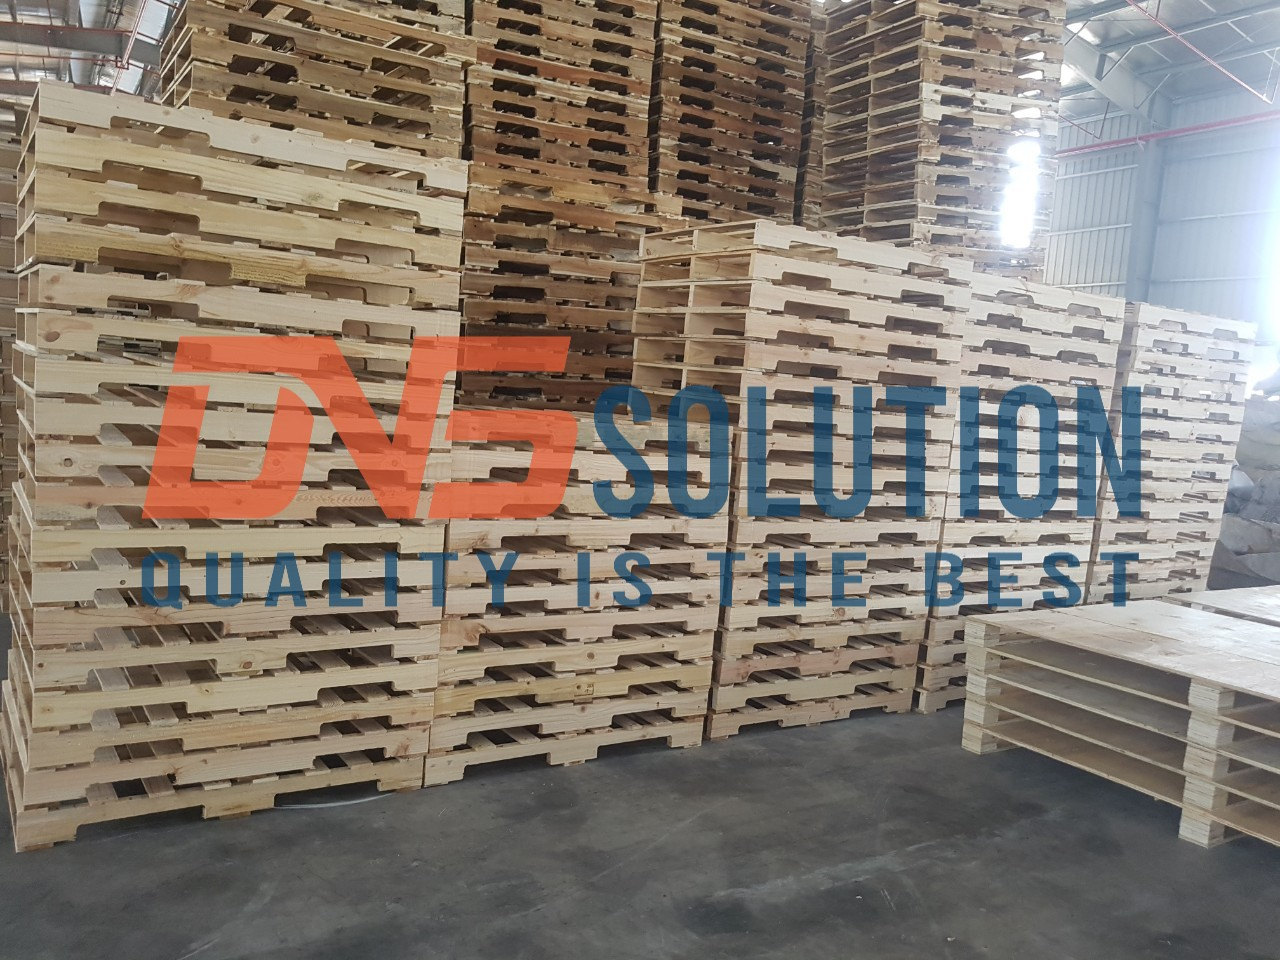 kho pallet gỗ dns solution